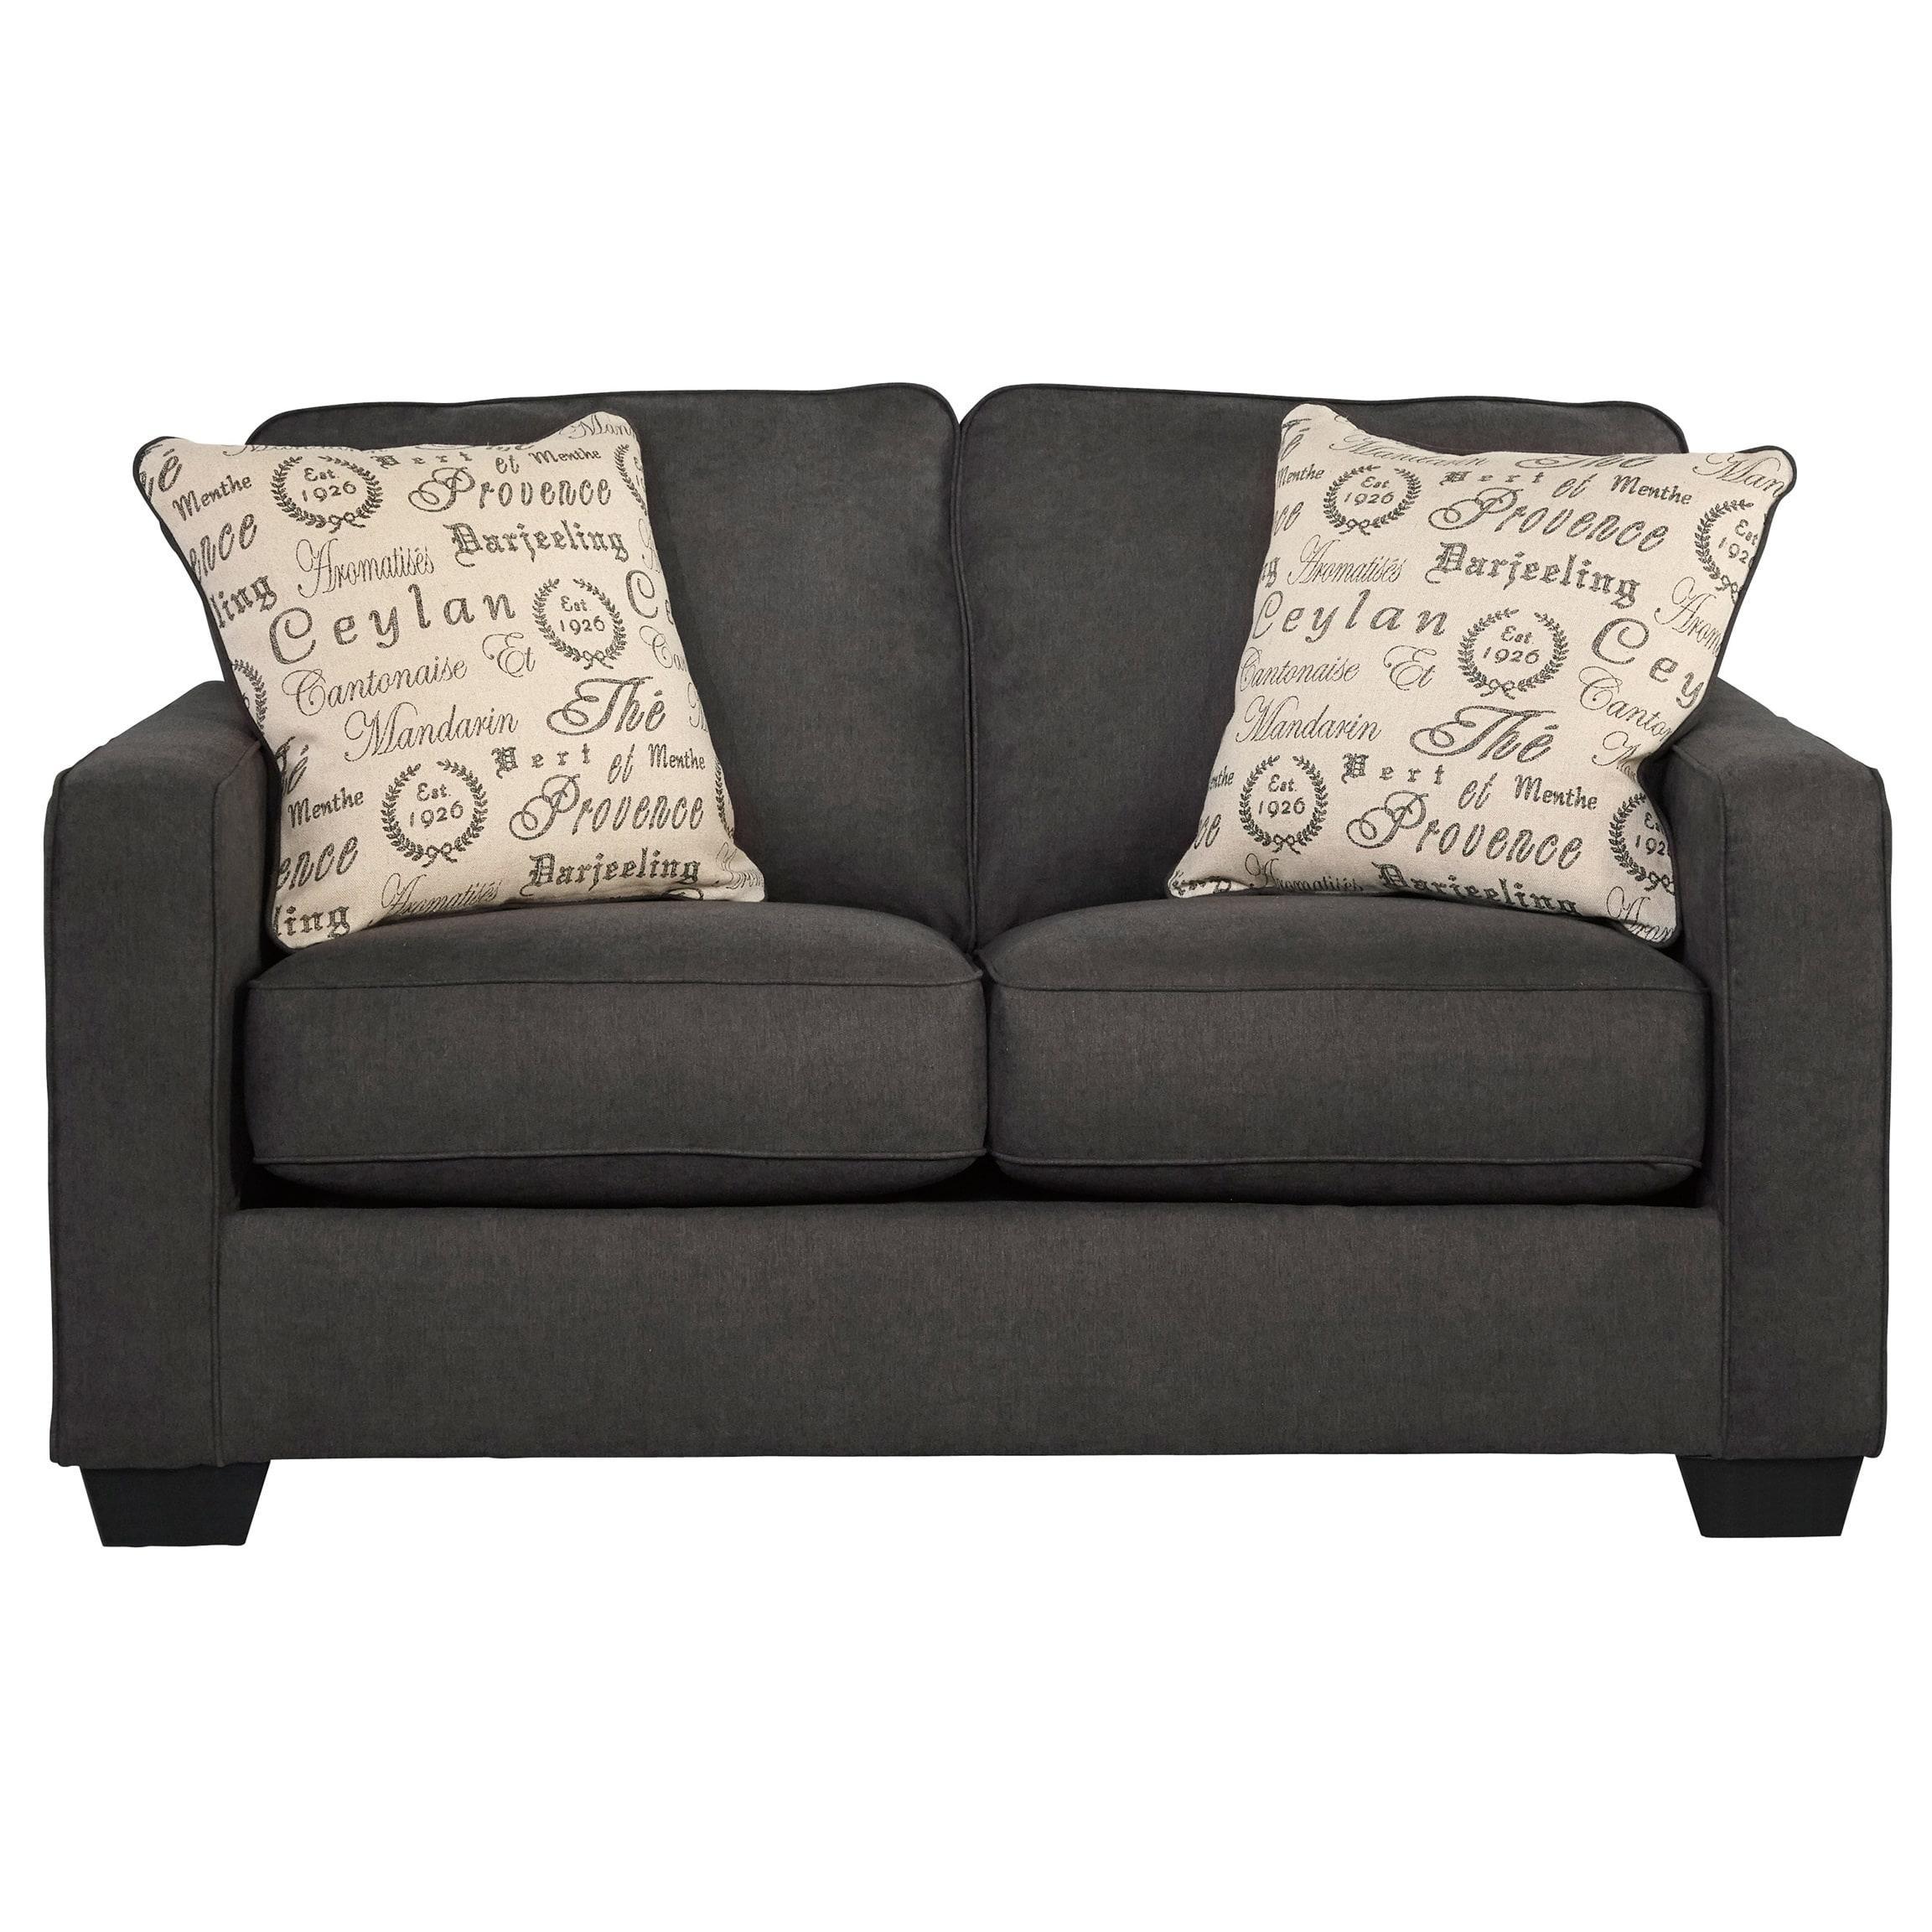 Signature Designashley Sofas, Couches & Loveseats – Shop The Regarding Ashley Tufted Sofa (View 17 of 20)